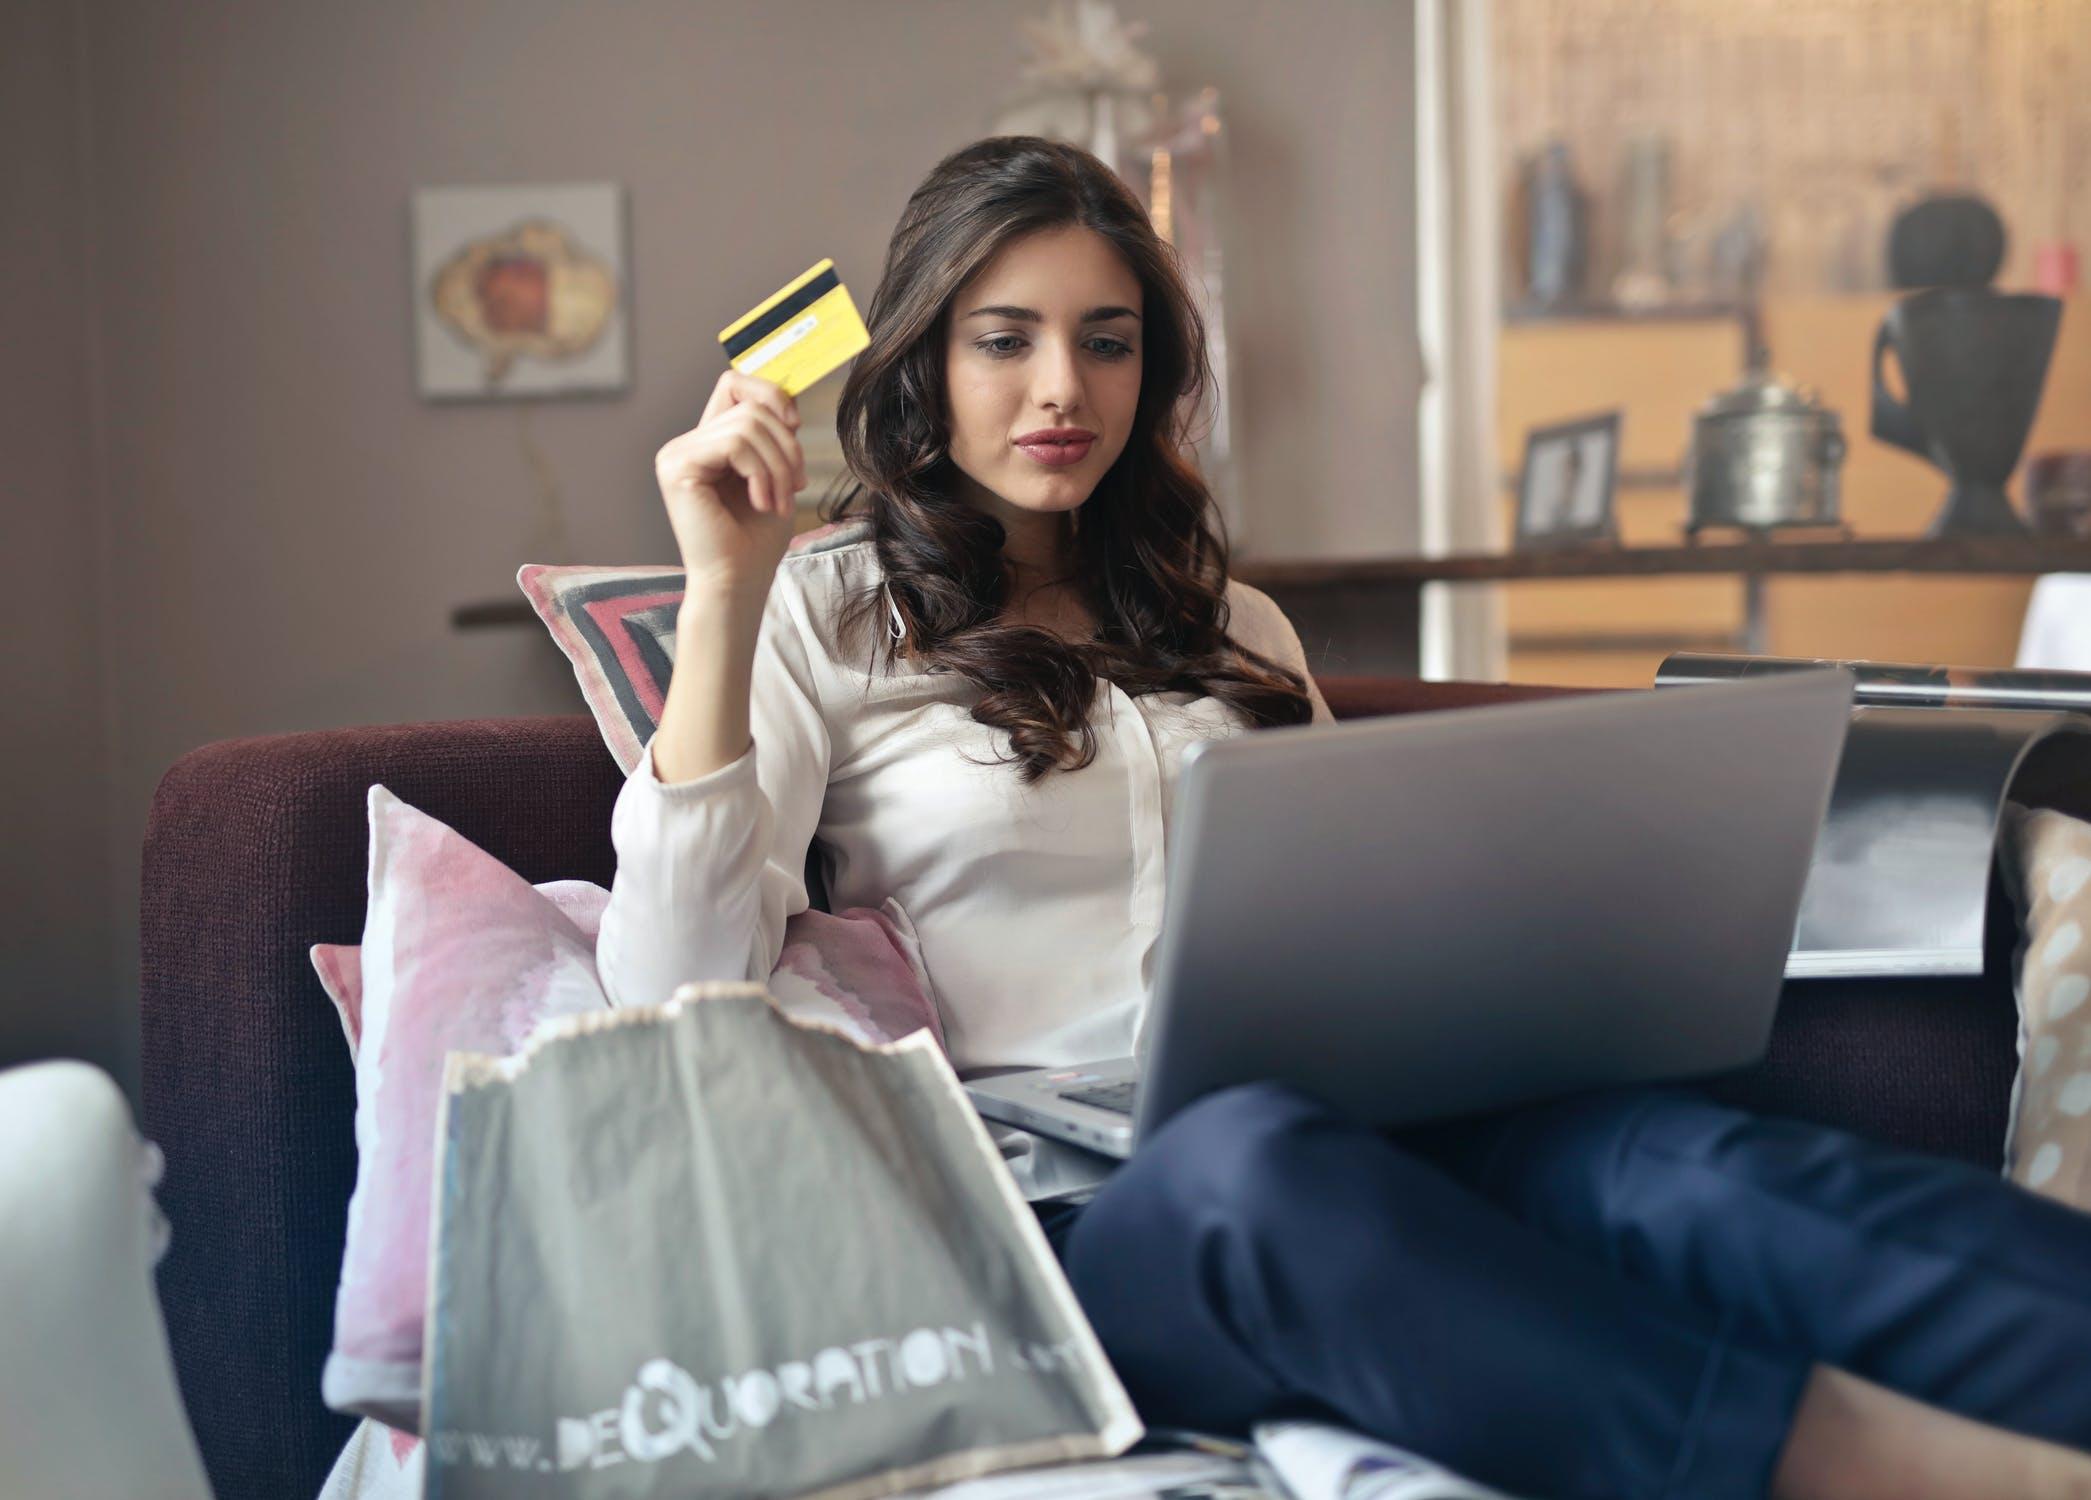 consumer data defined